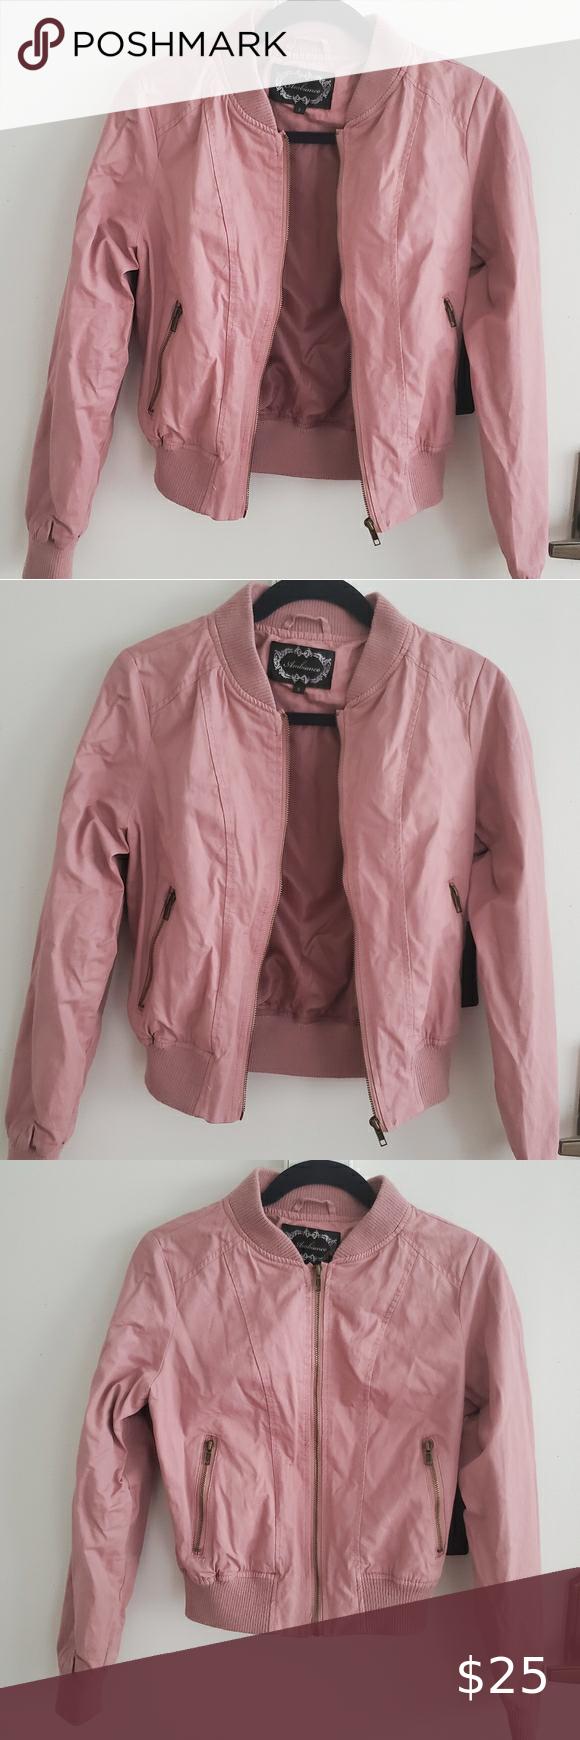 Pink Ambiance Jacket Black Faux Leather Jacket Coats Jackets Women Brown Faux Leather Jacket [ 1740 x 580 Pixel ]